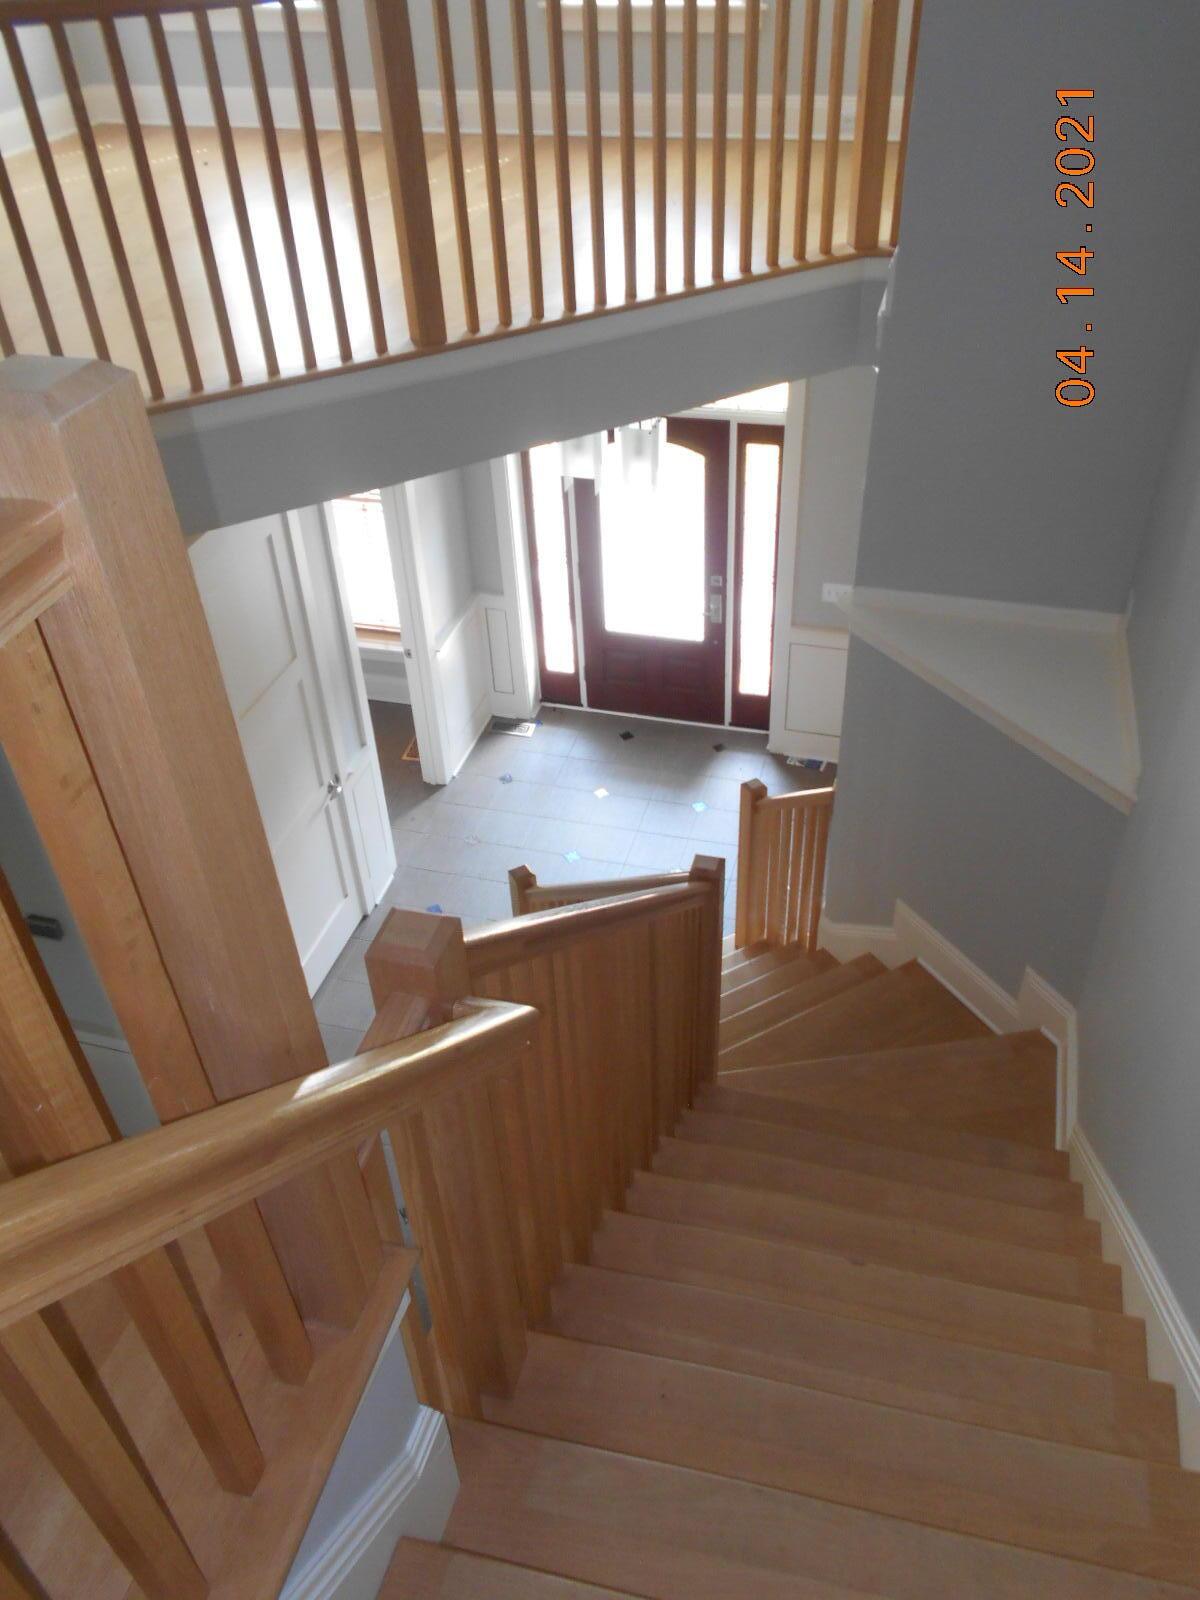 Beresford Creek Landing Homes For Sale - 1212 Winding Creek, Charleston, SC - 12